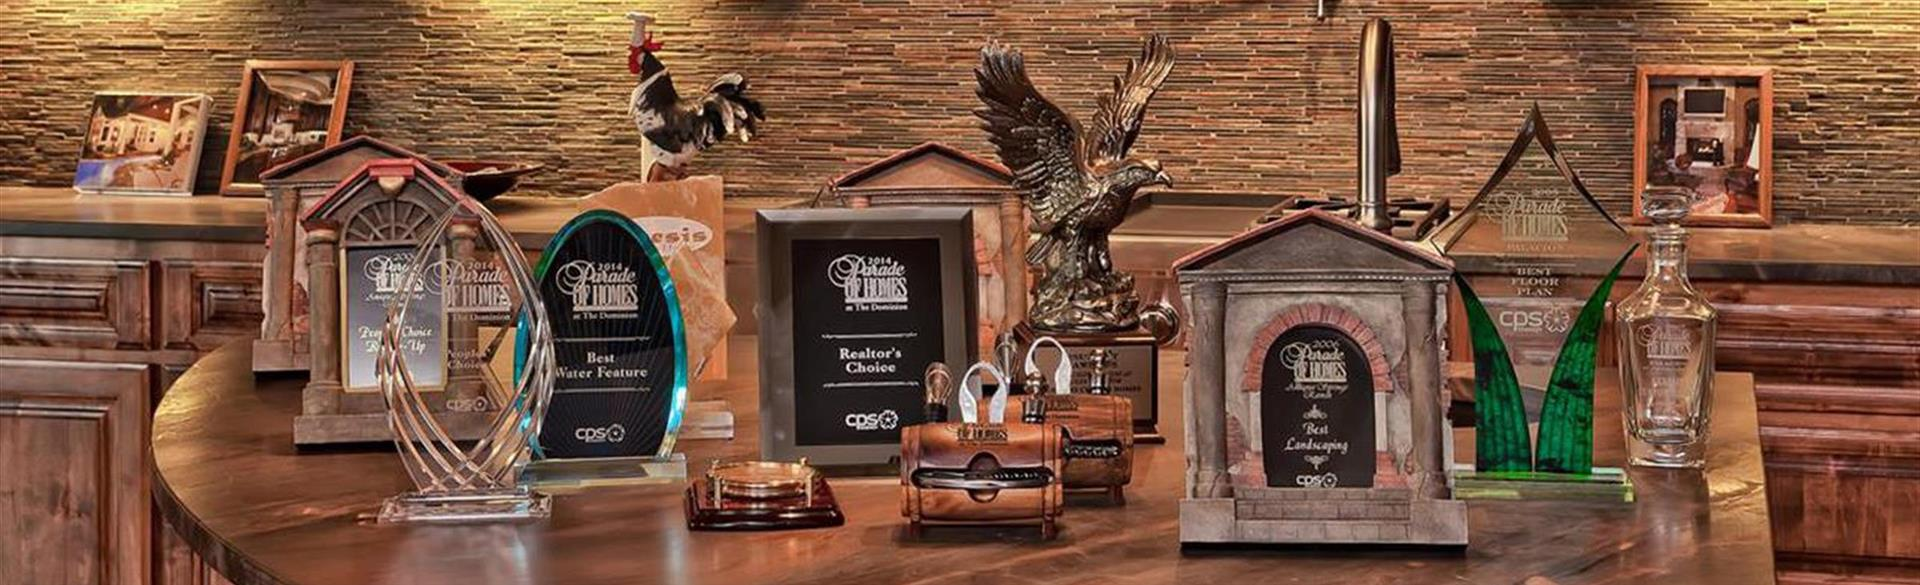 Award Winning Luxury Home Builder Luxury Home Builder